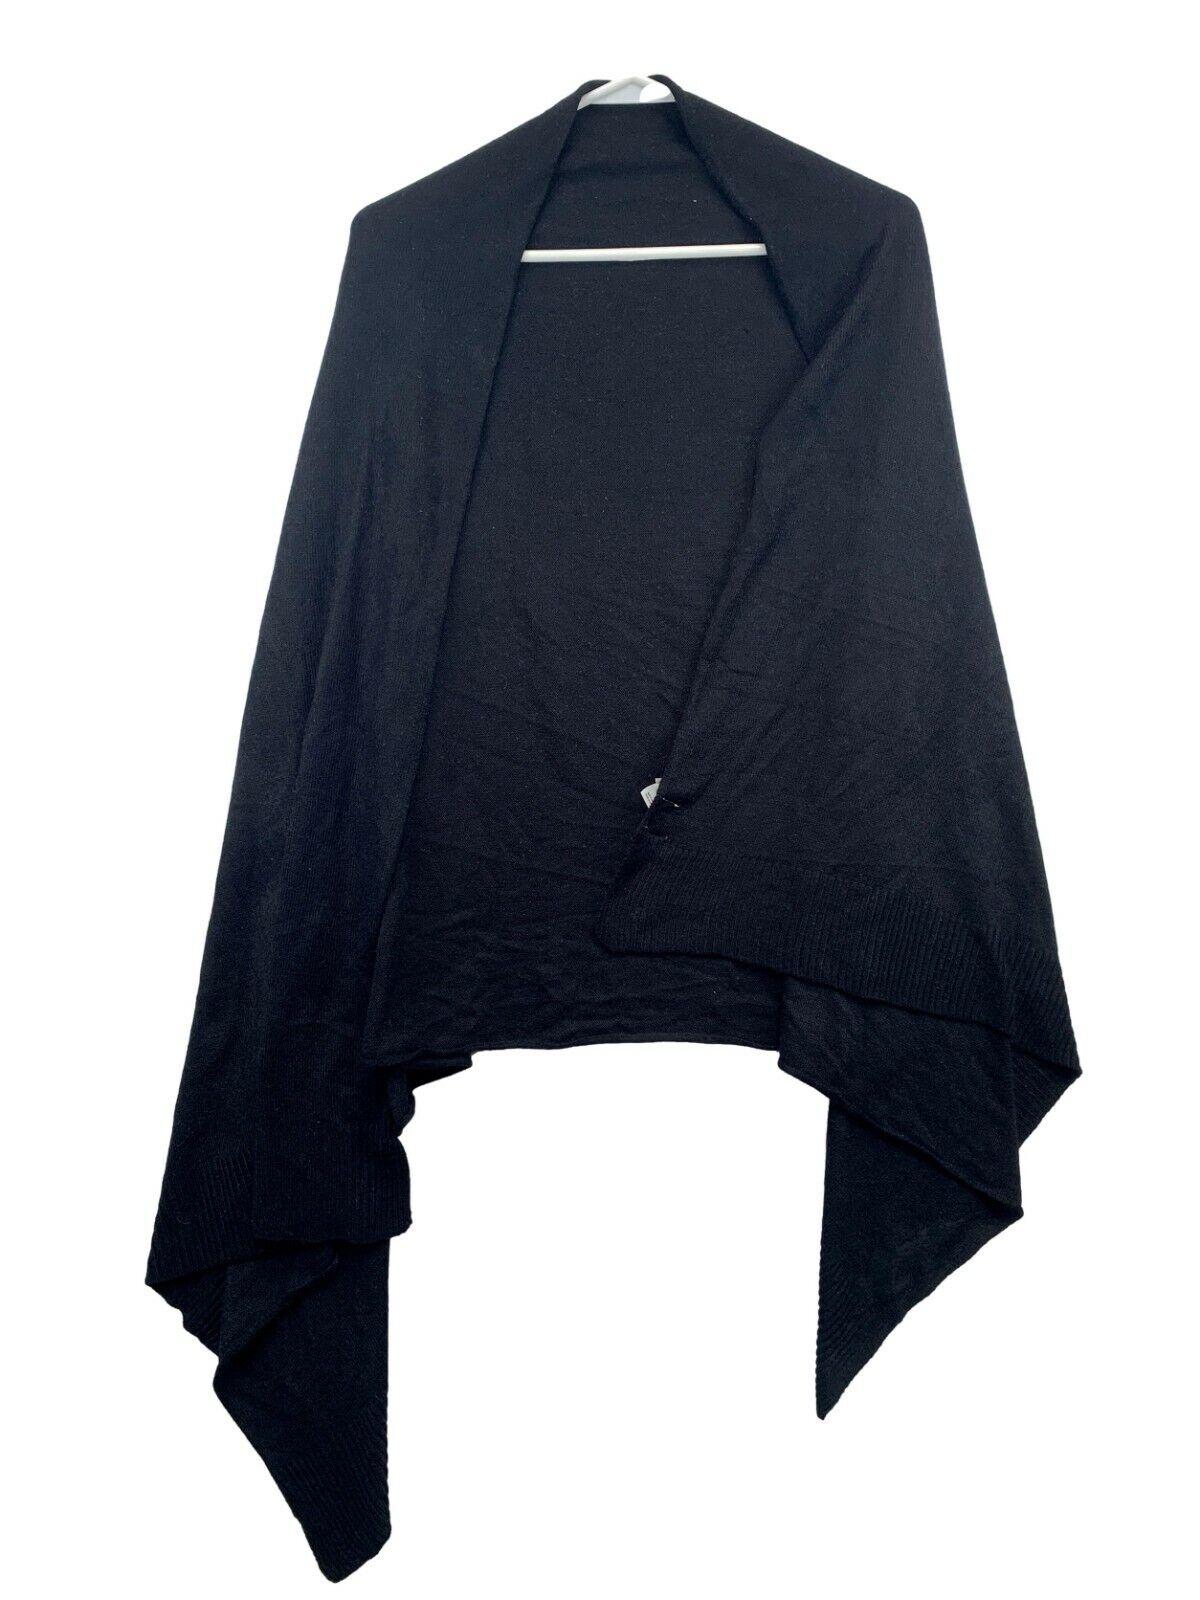 A new day scarf black size M acrylic